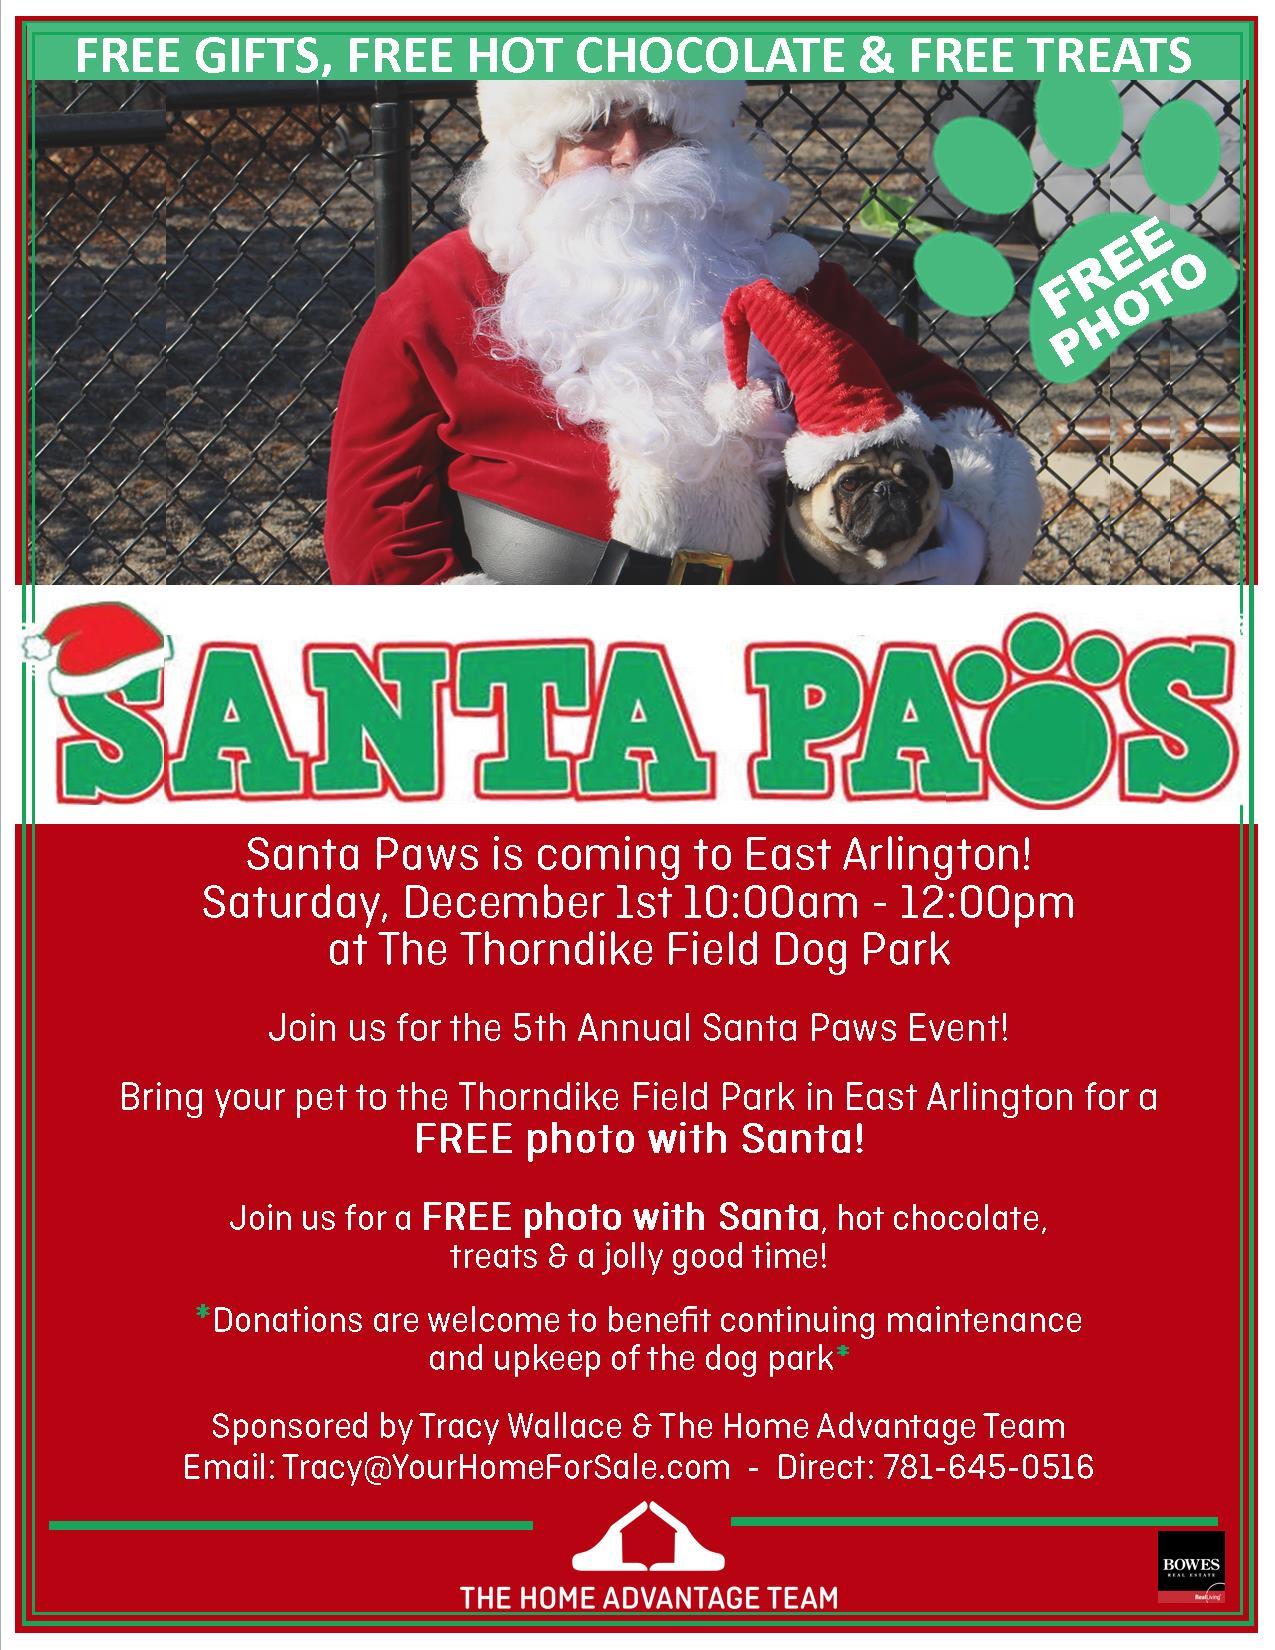 Santa Paws in East Arlington